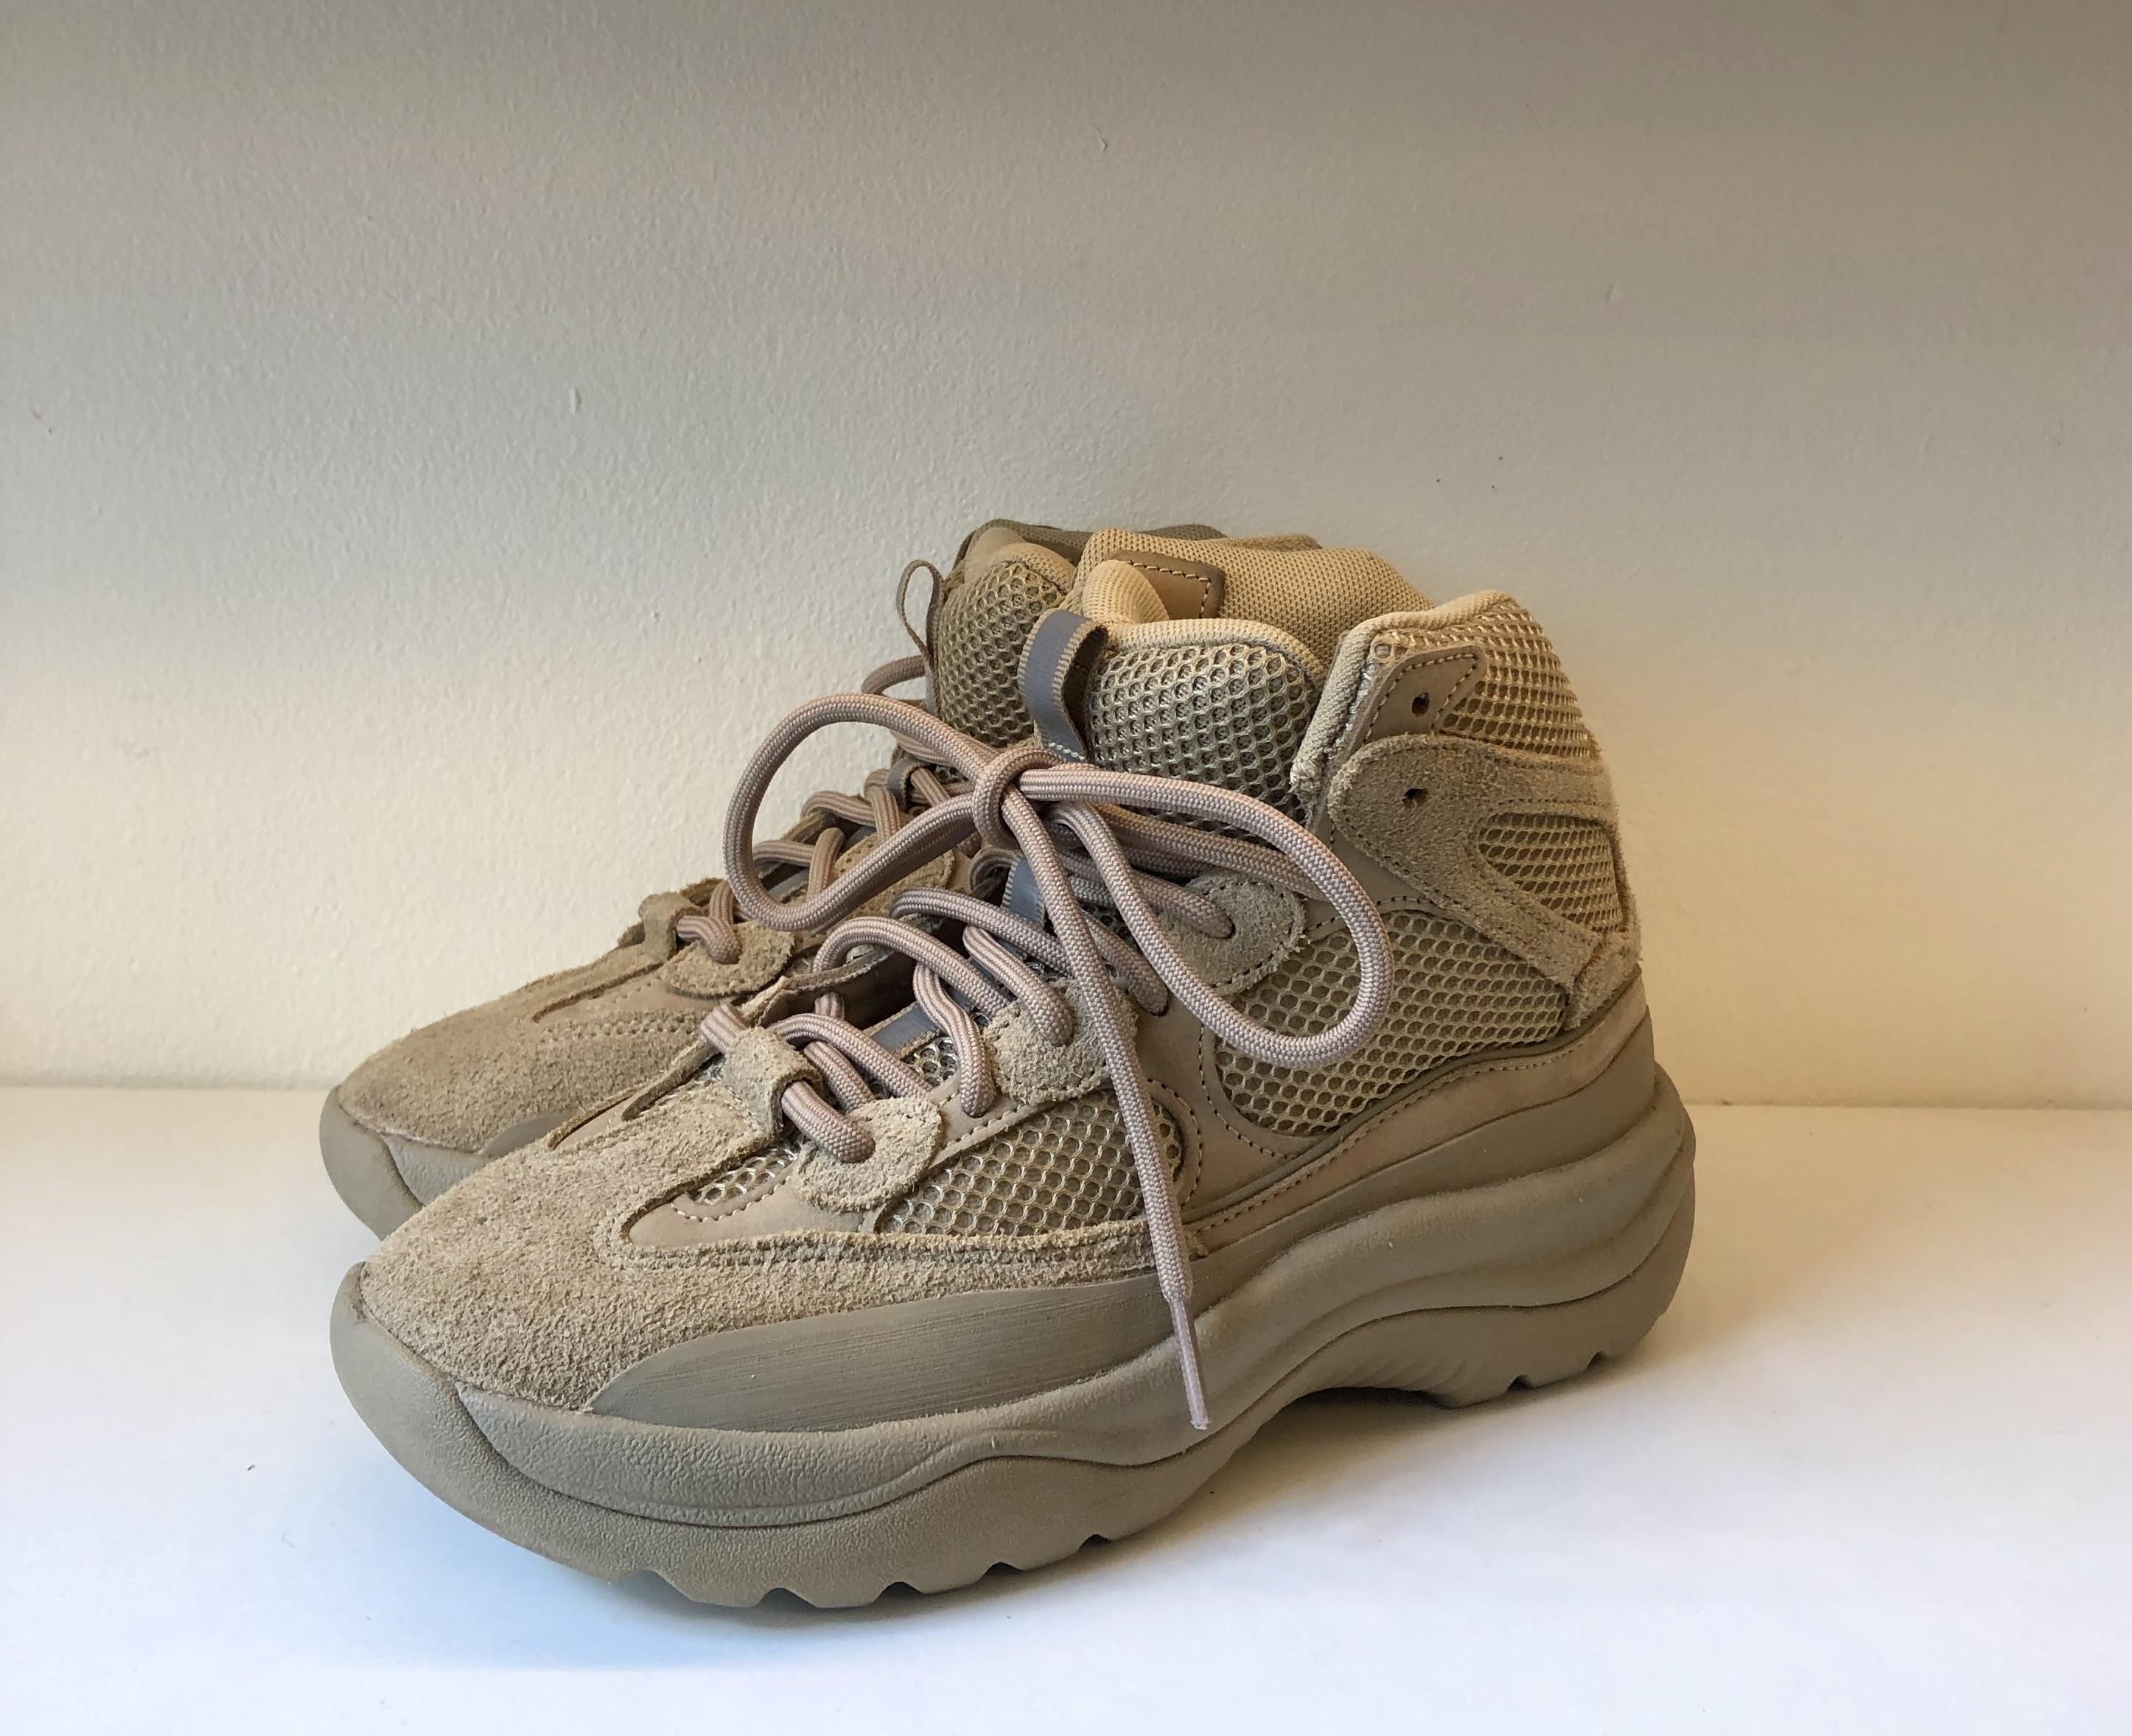 Adidas Yeezy Desert Boot Rock